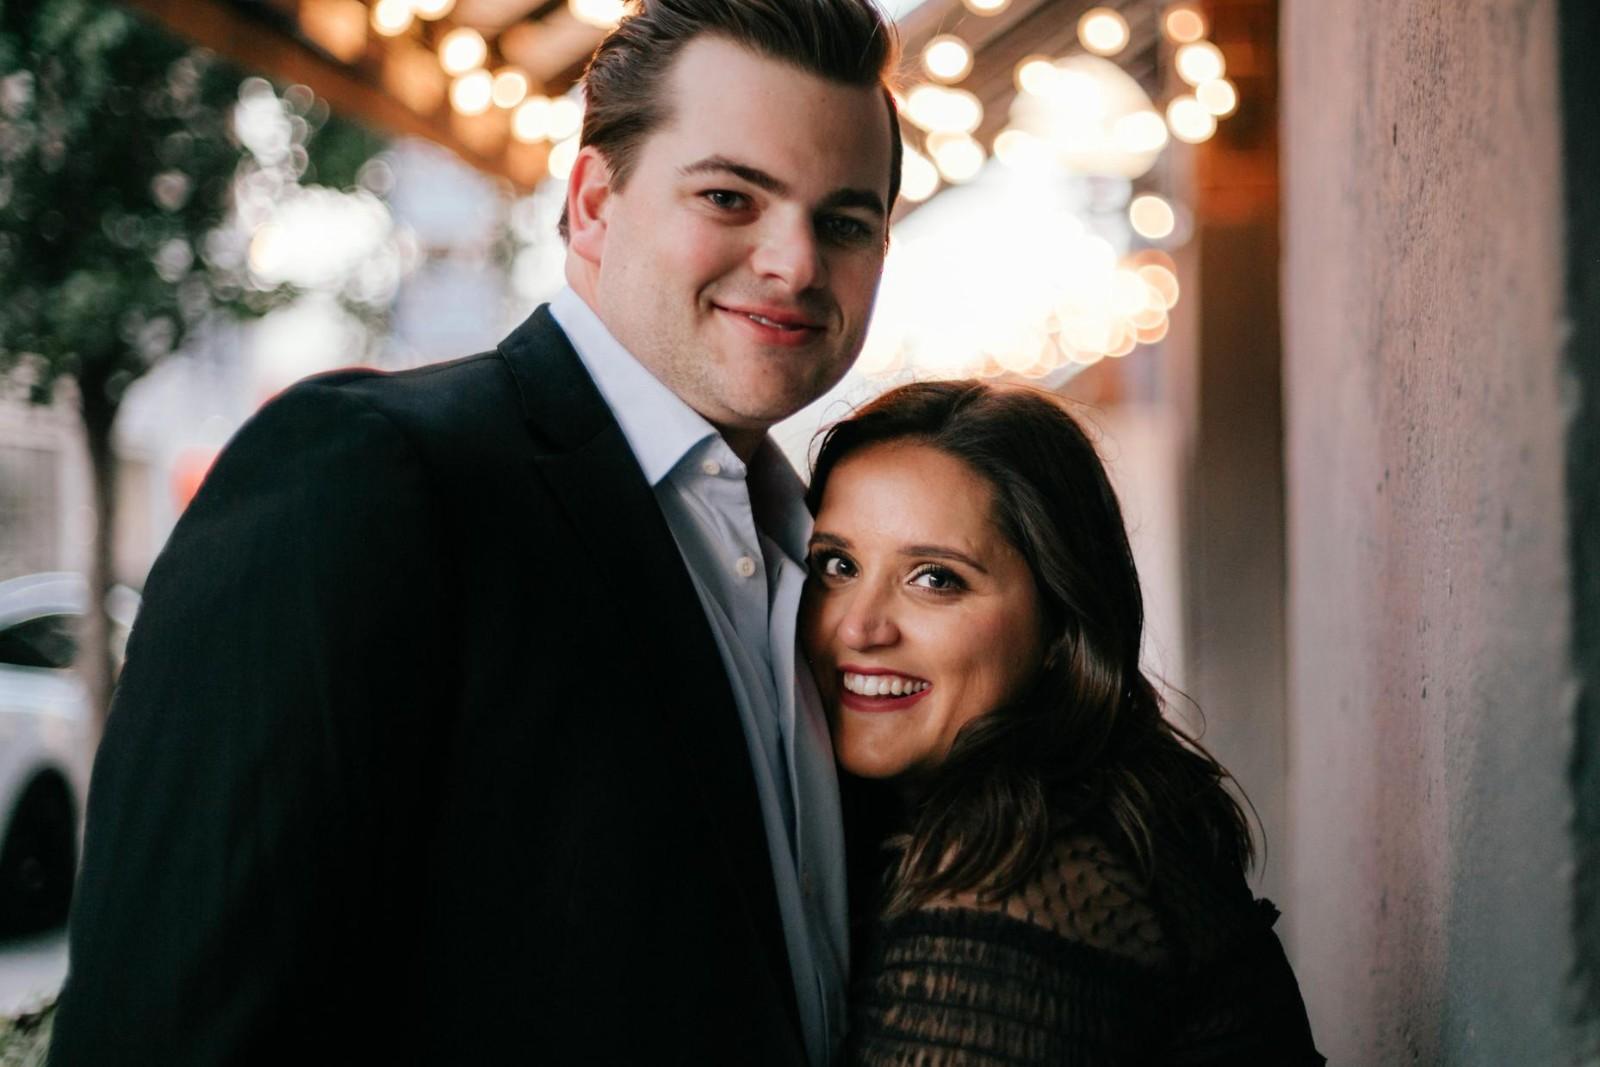 Grace Kennedy and Cameron Wallin